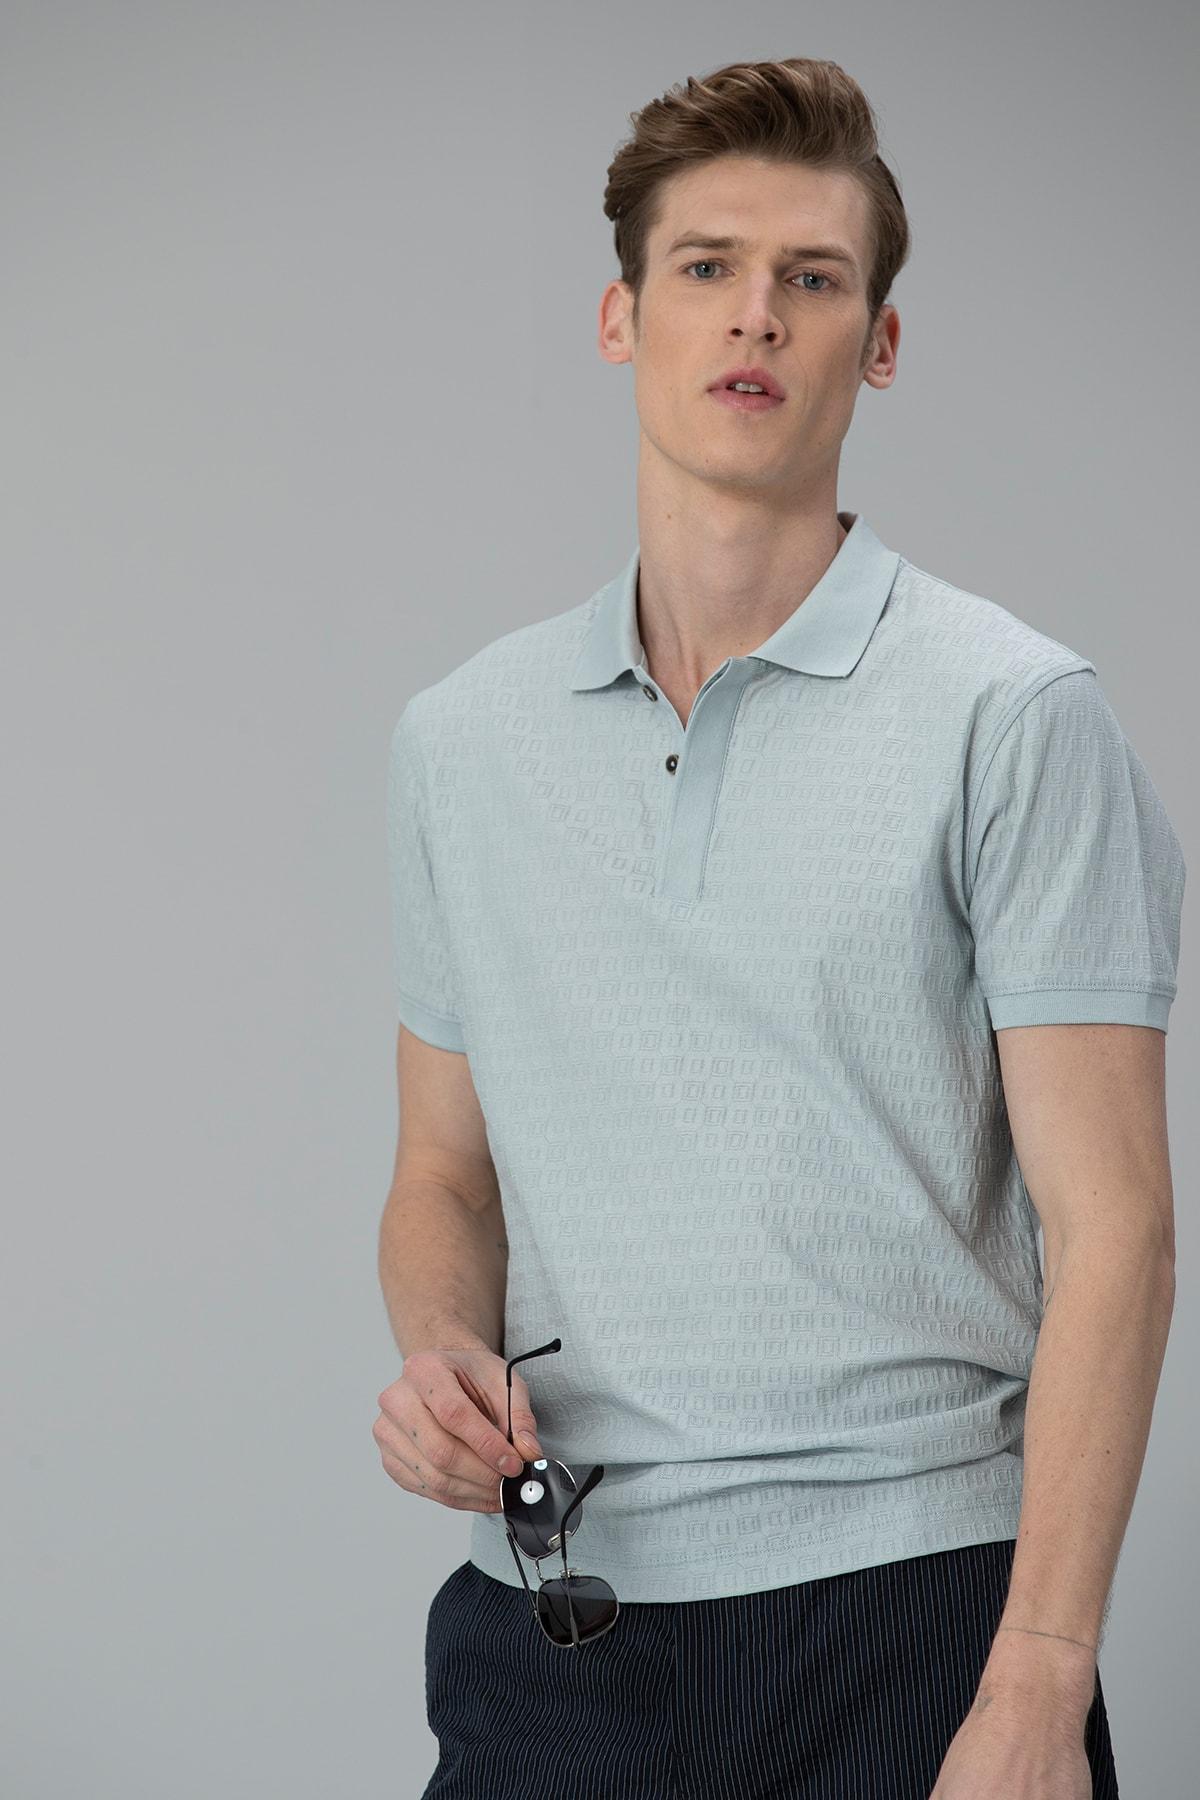 Lufian Clar Spor Polo T- Shirt Açık Nane 1